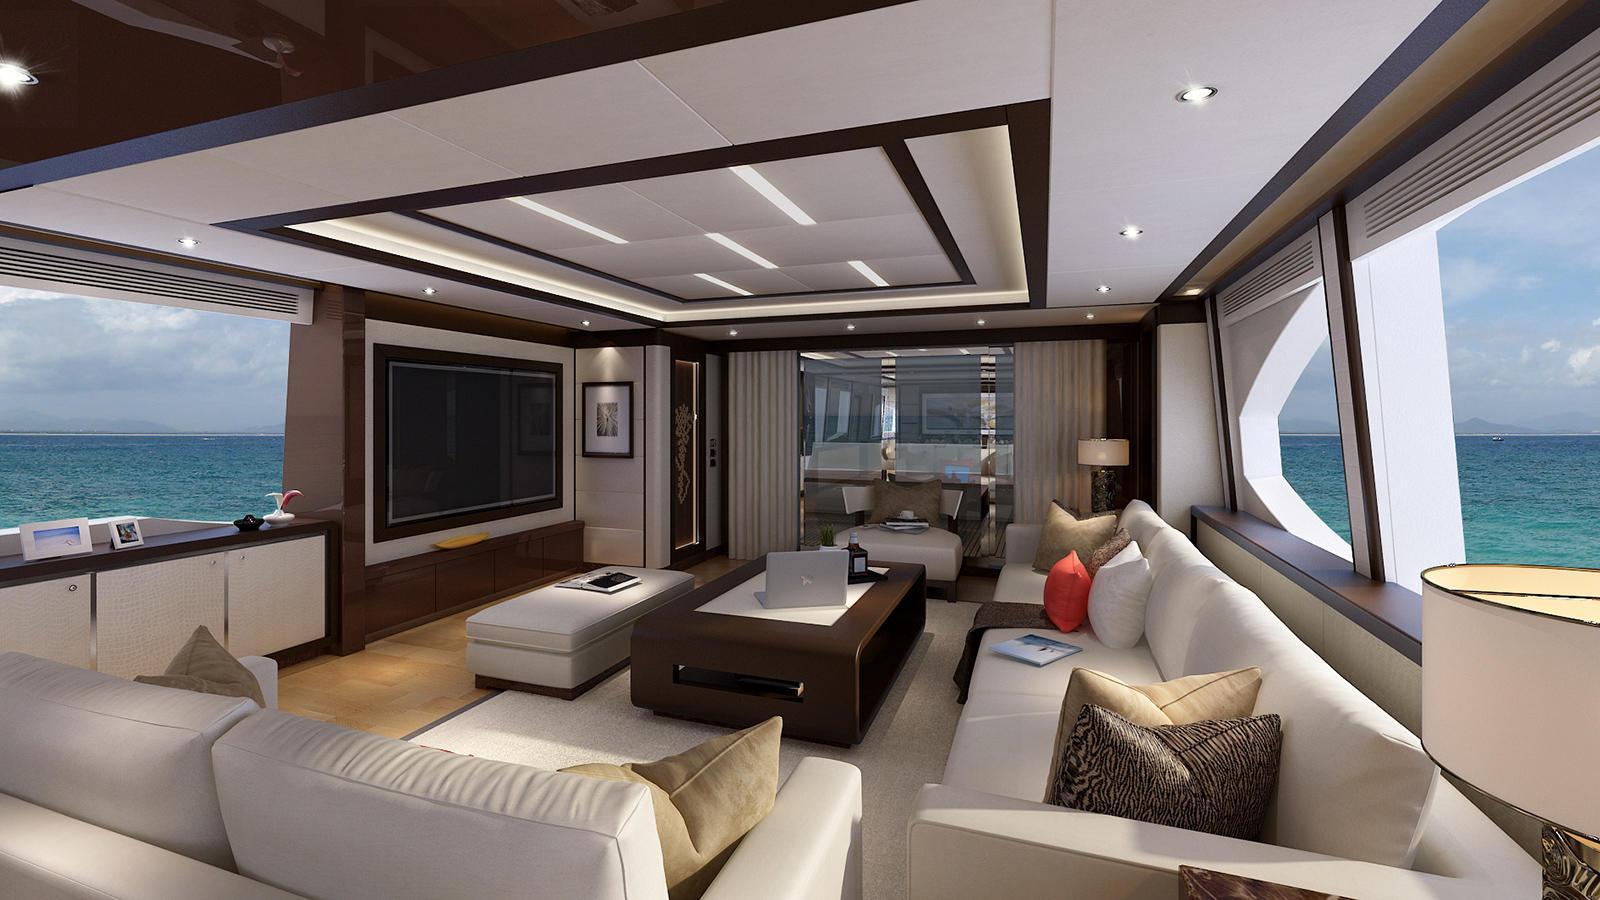 Asteria 108 motoryacht HeySea Yachts 33m 2019 saloon sistership